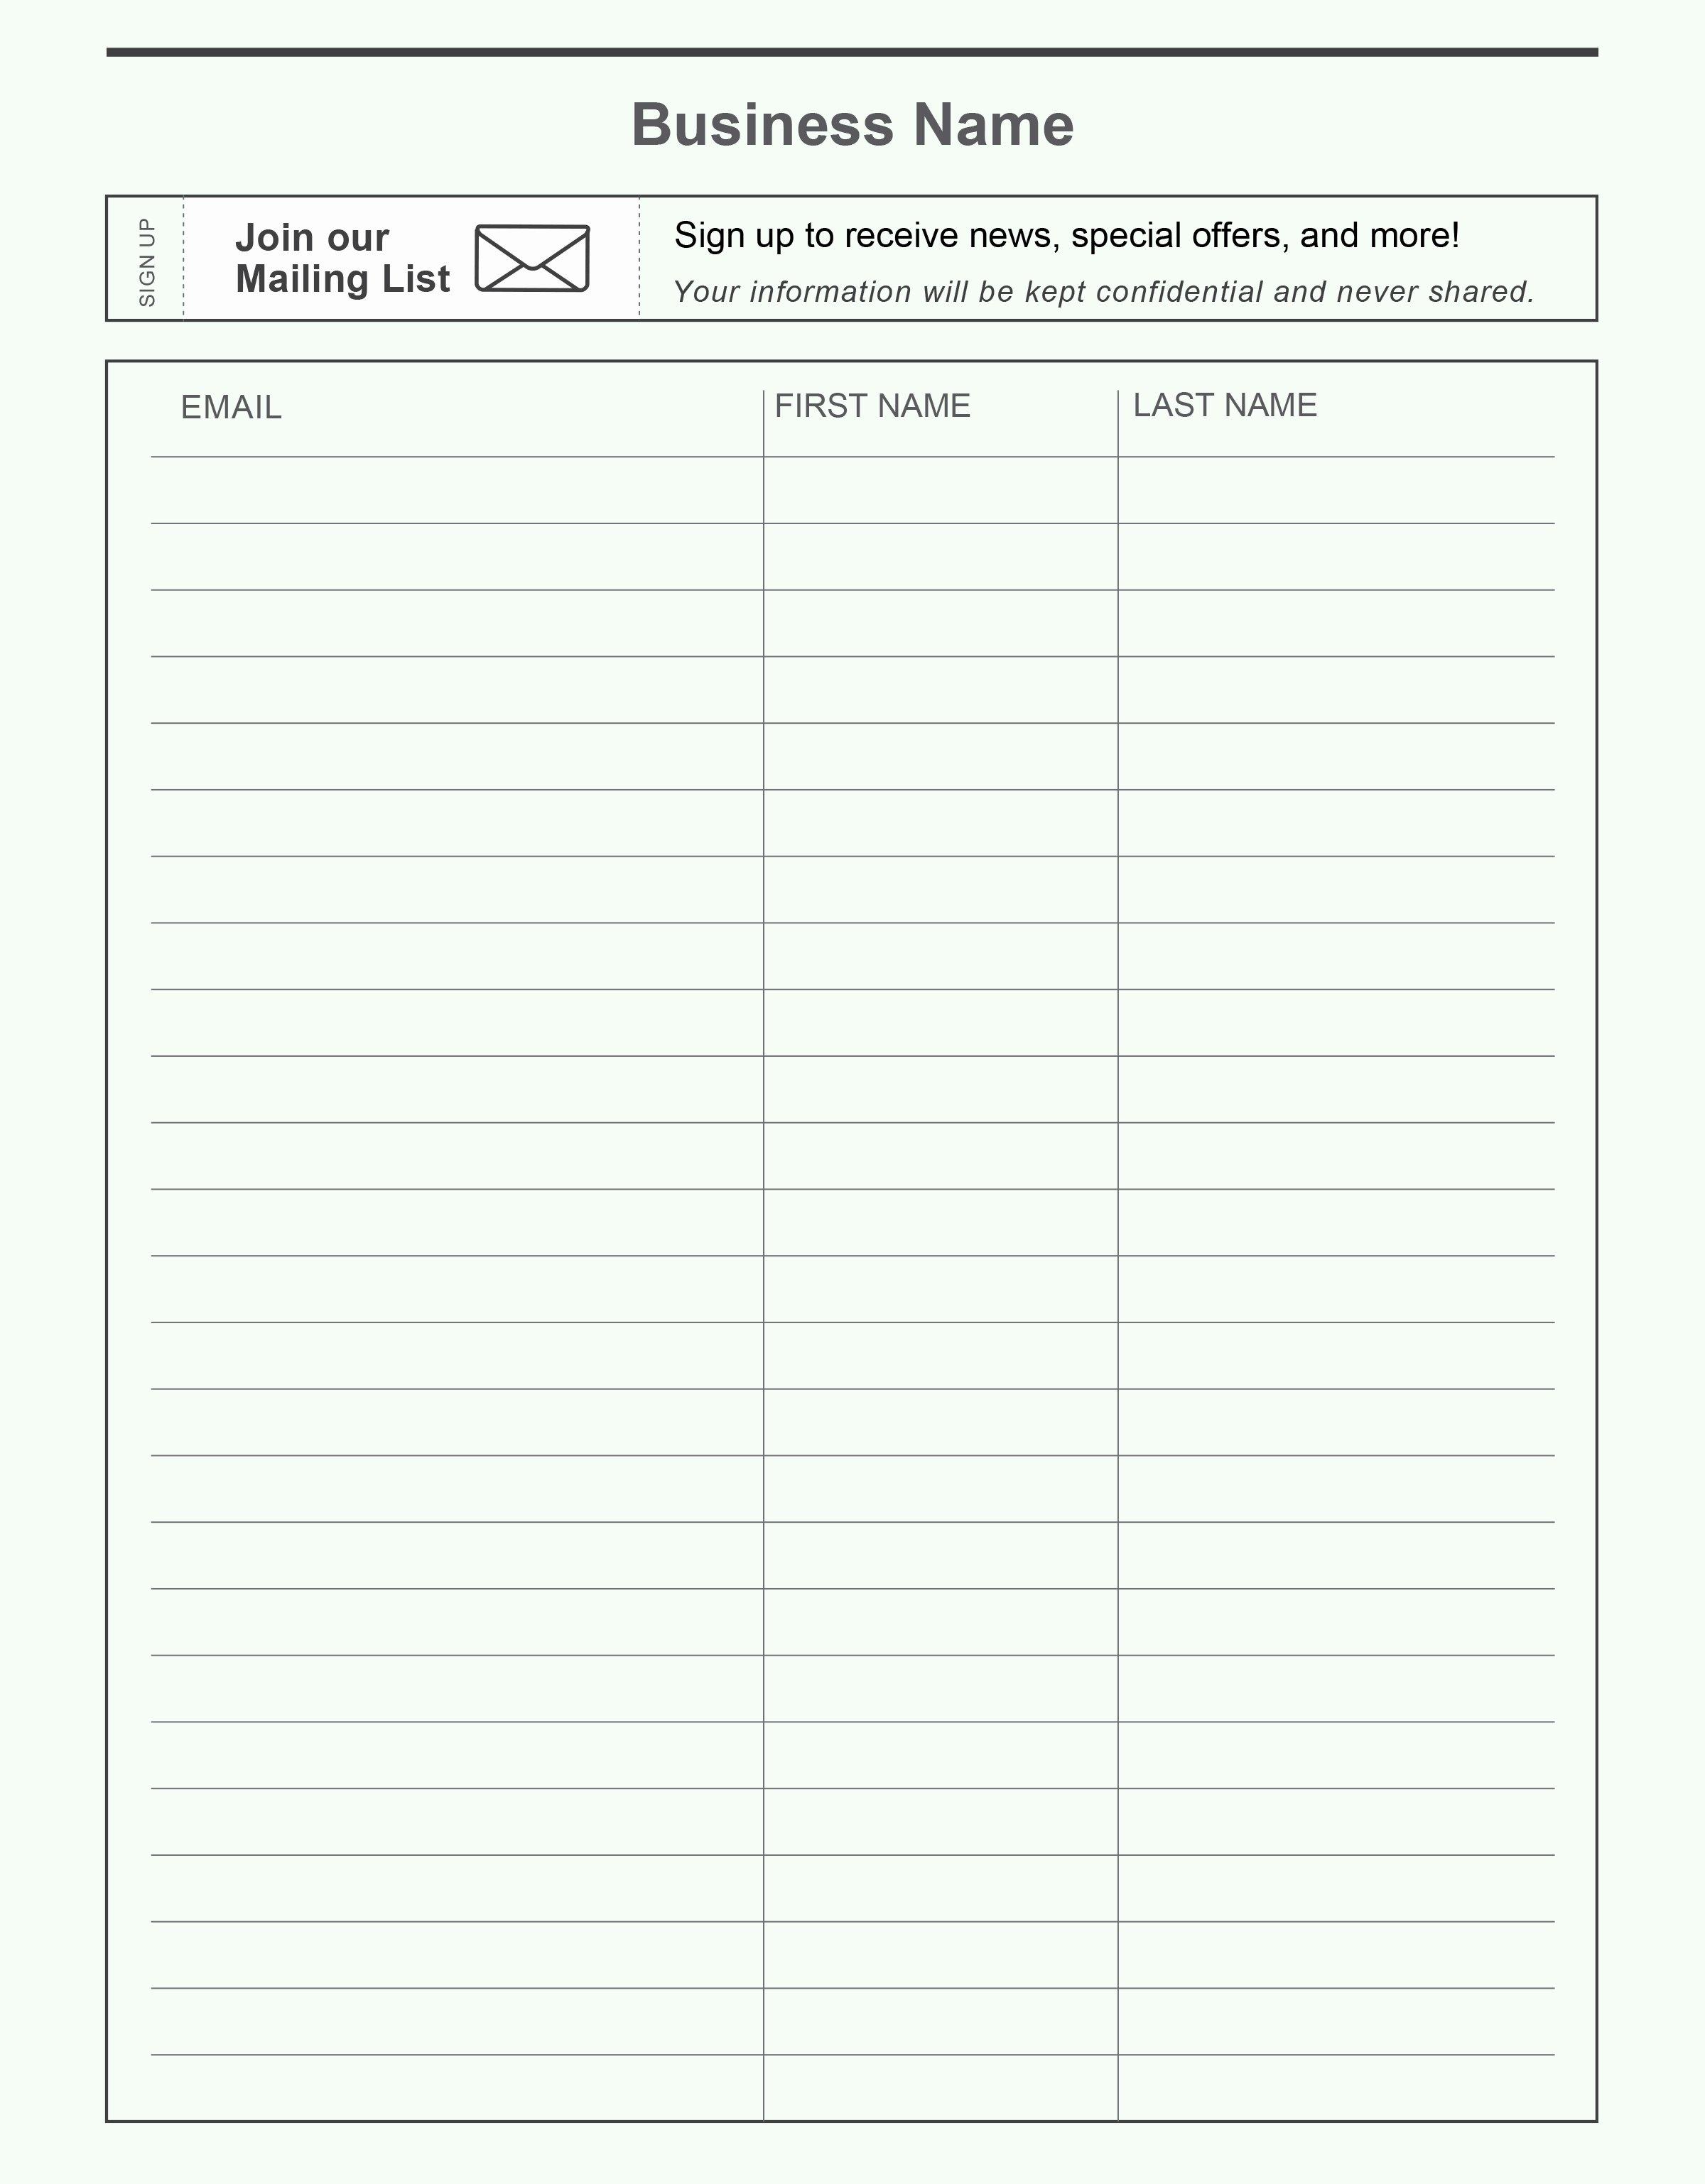 Name and Email Sign Up Sheet Portablegasgrillweber